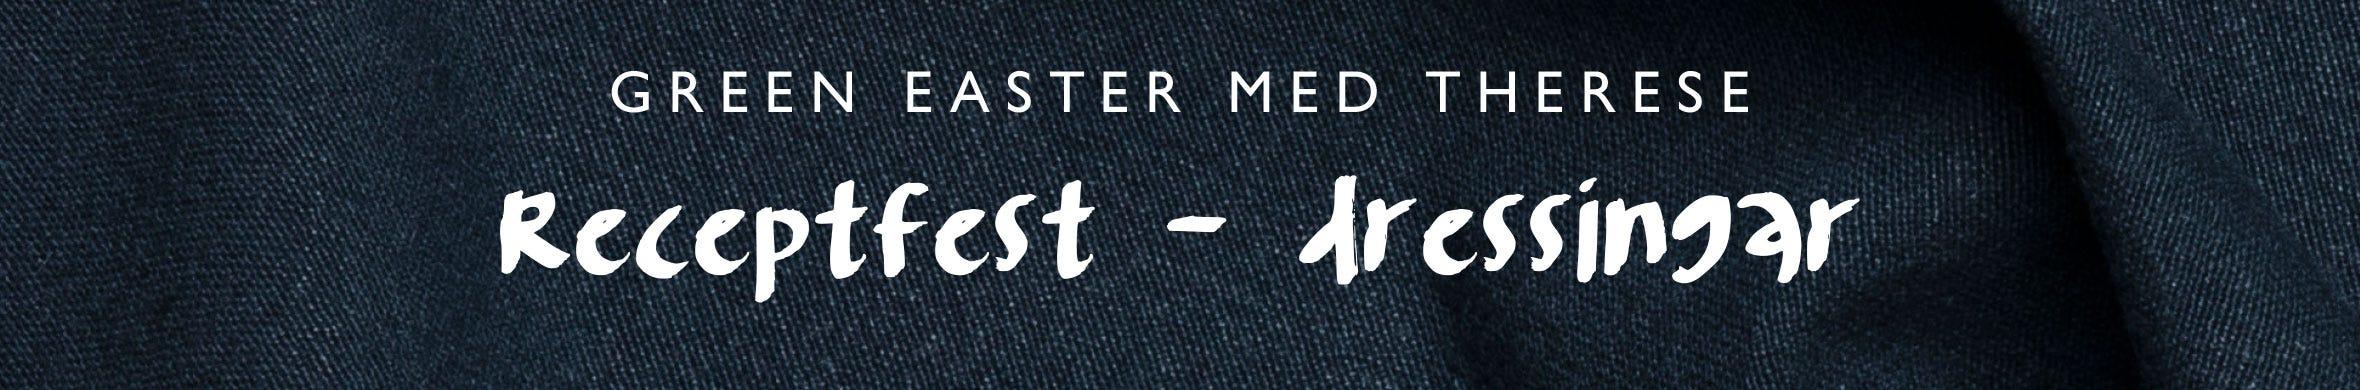 GREEN EASTER MED THERESE - Receptfest dressingar